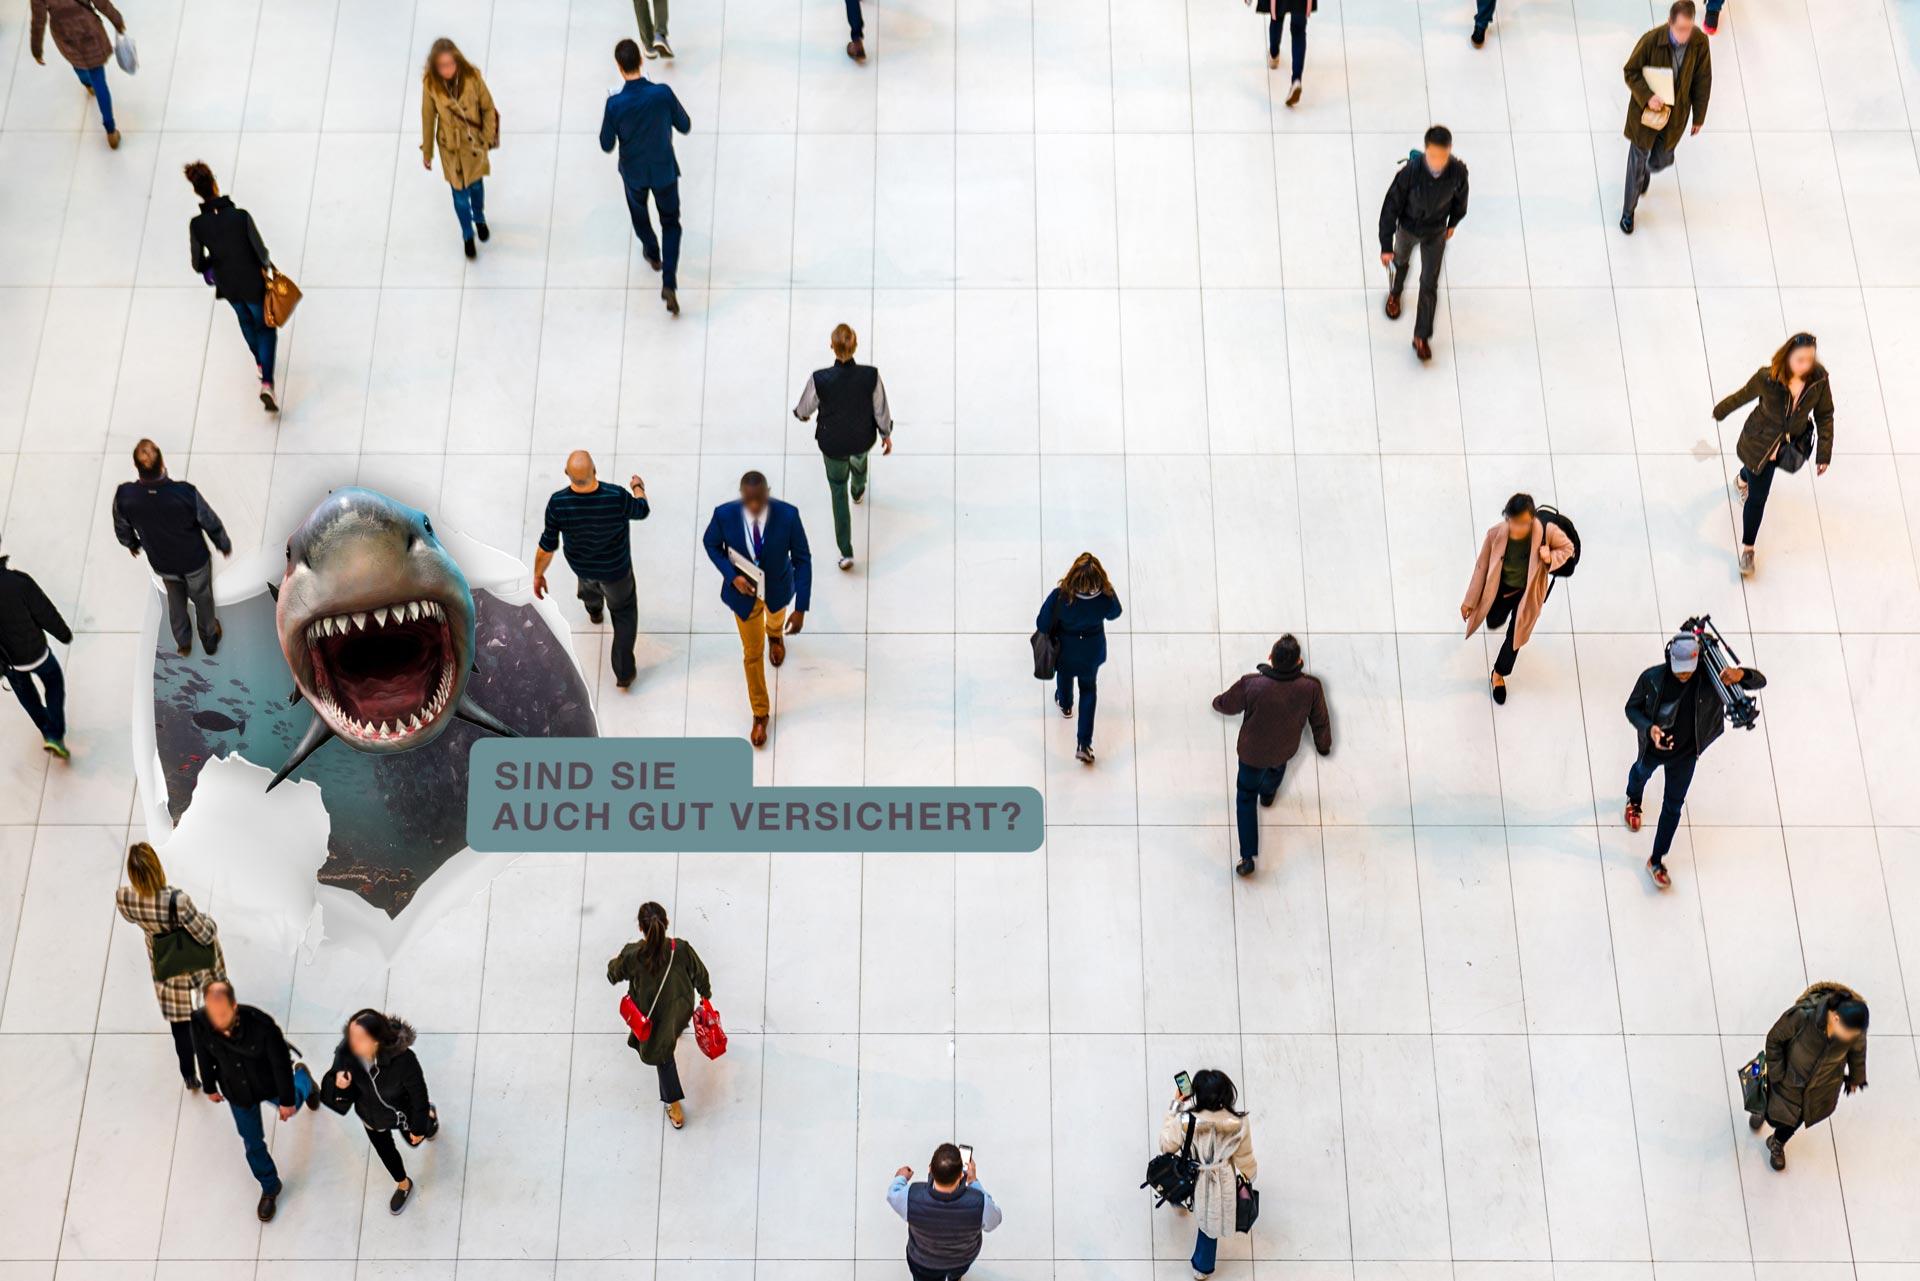 Bodenaufkleber Werbekampagne am Boden